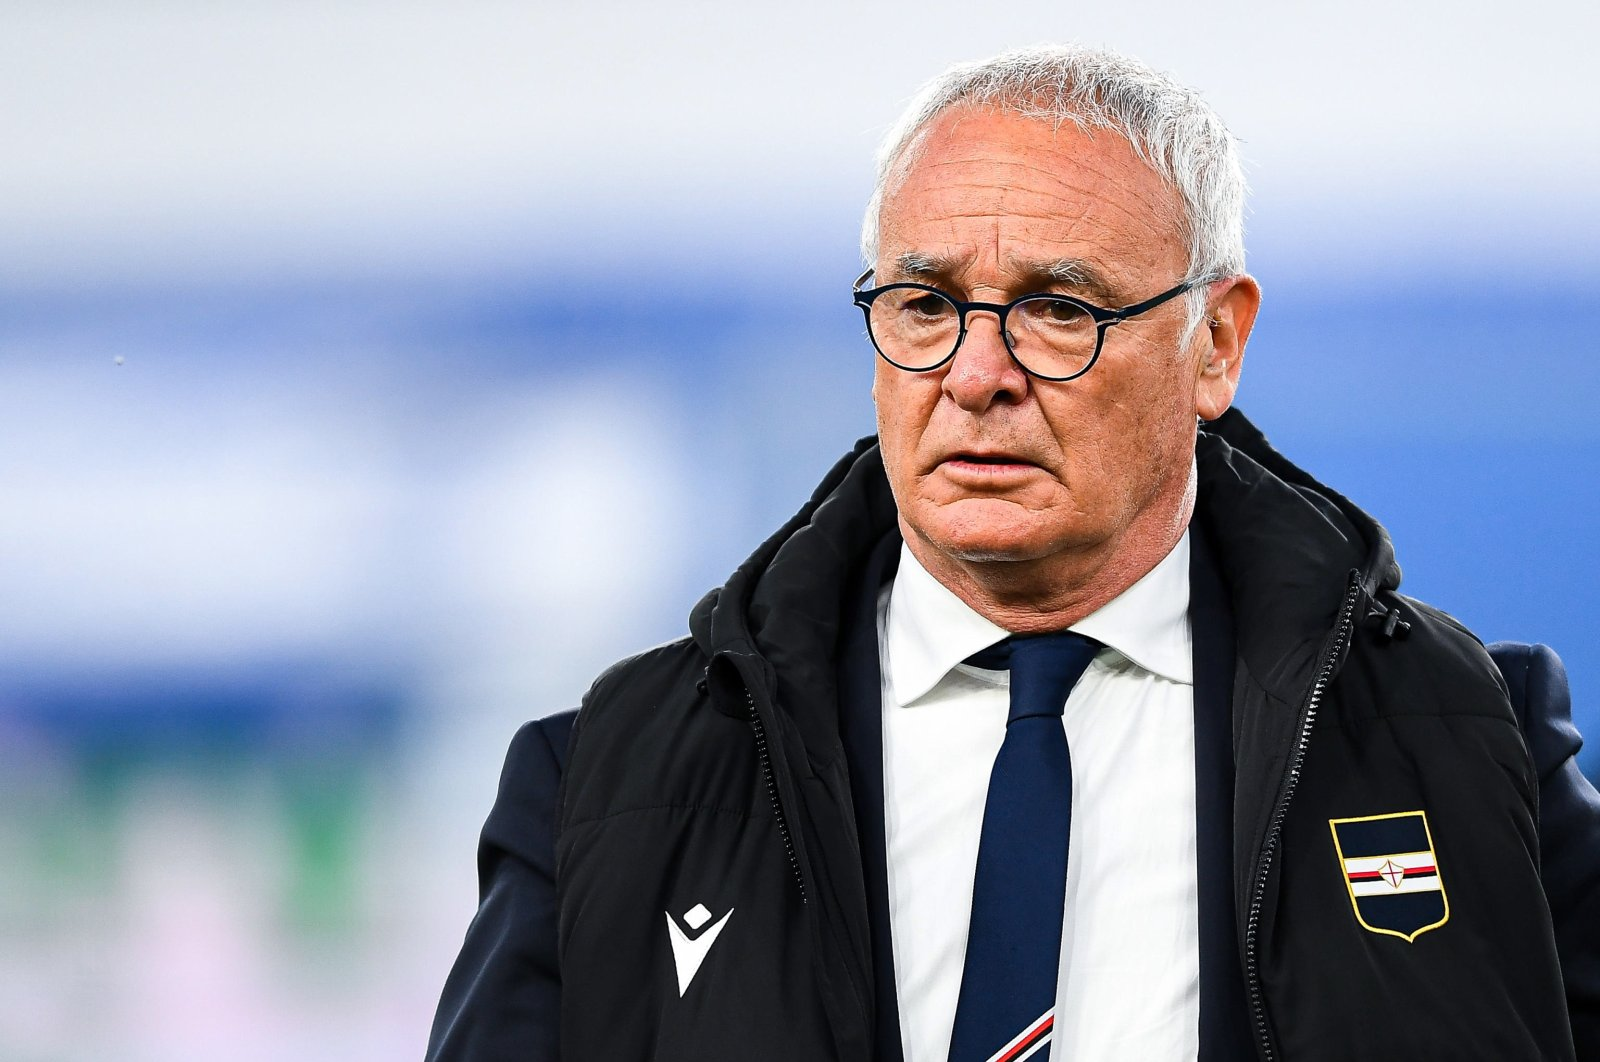 Sampdoria's Italian coach Claudio Ranieri during a match against Parma at Luigi Ferraris stadium, Genoa, Italy, May 22, 2021. (EPA Photo)